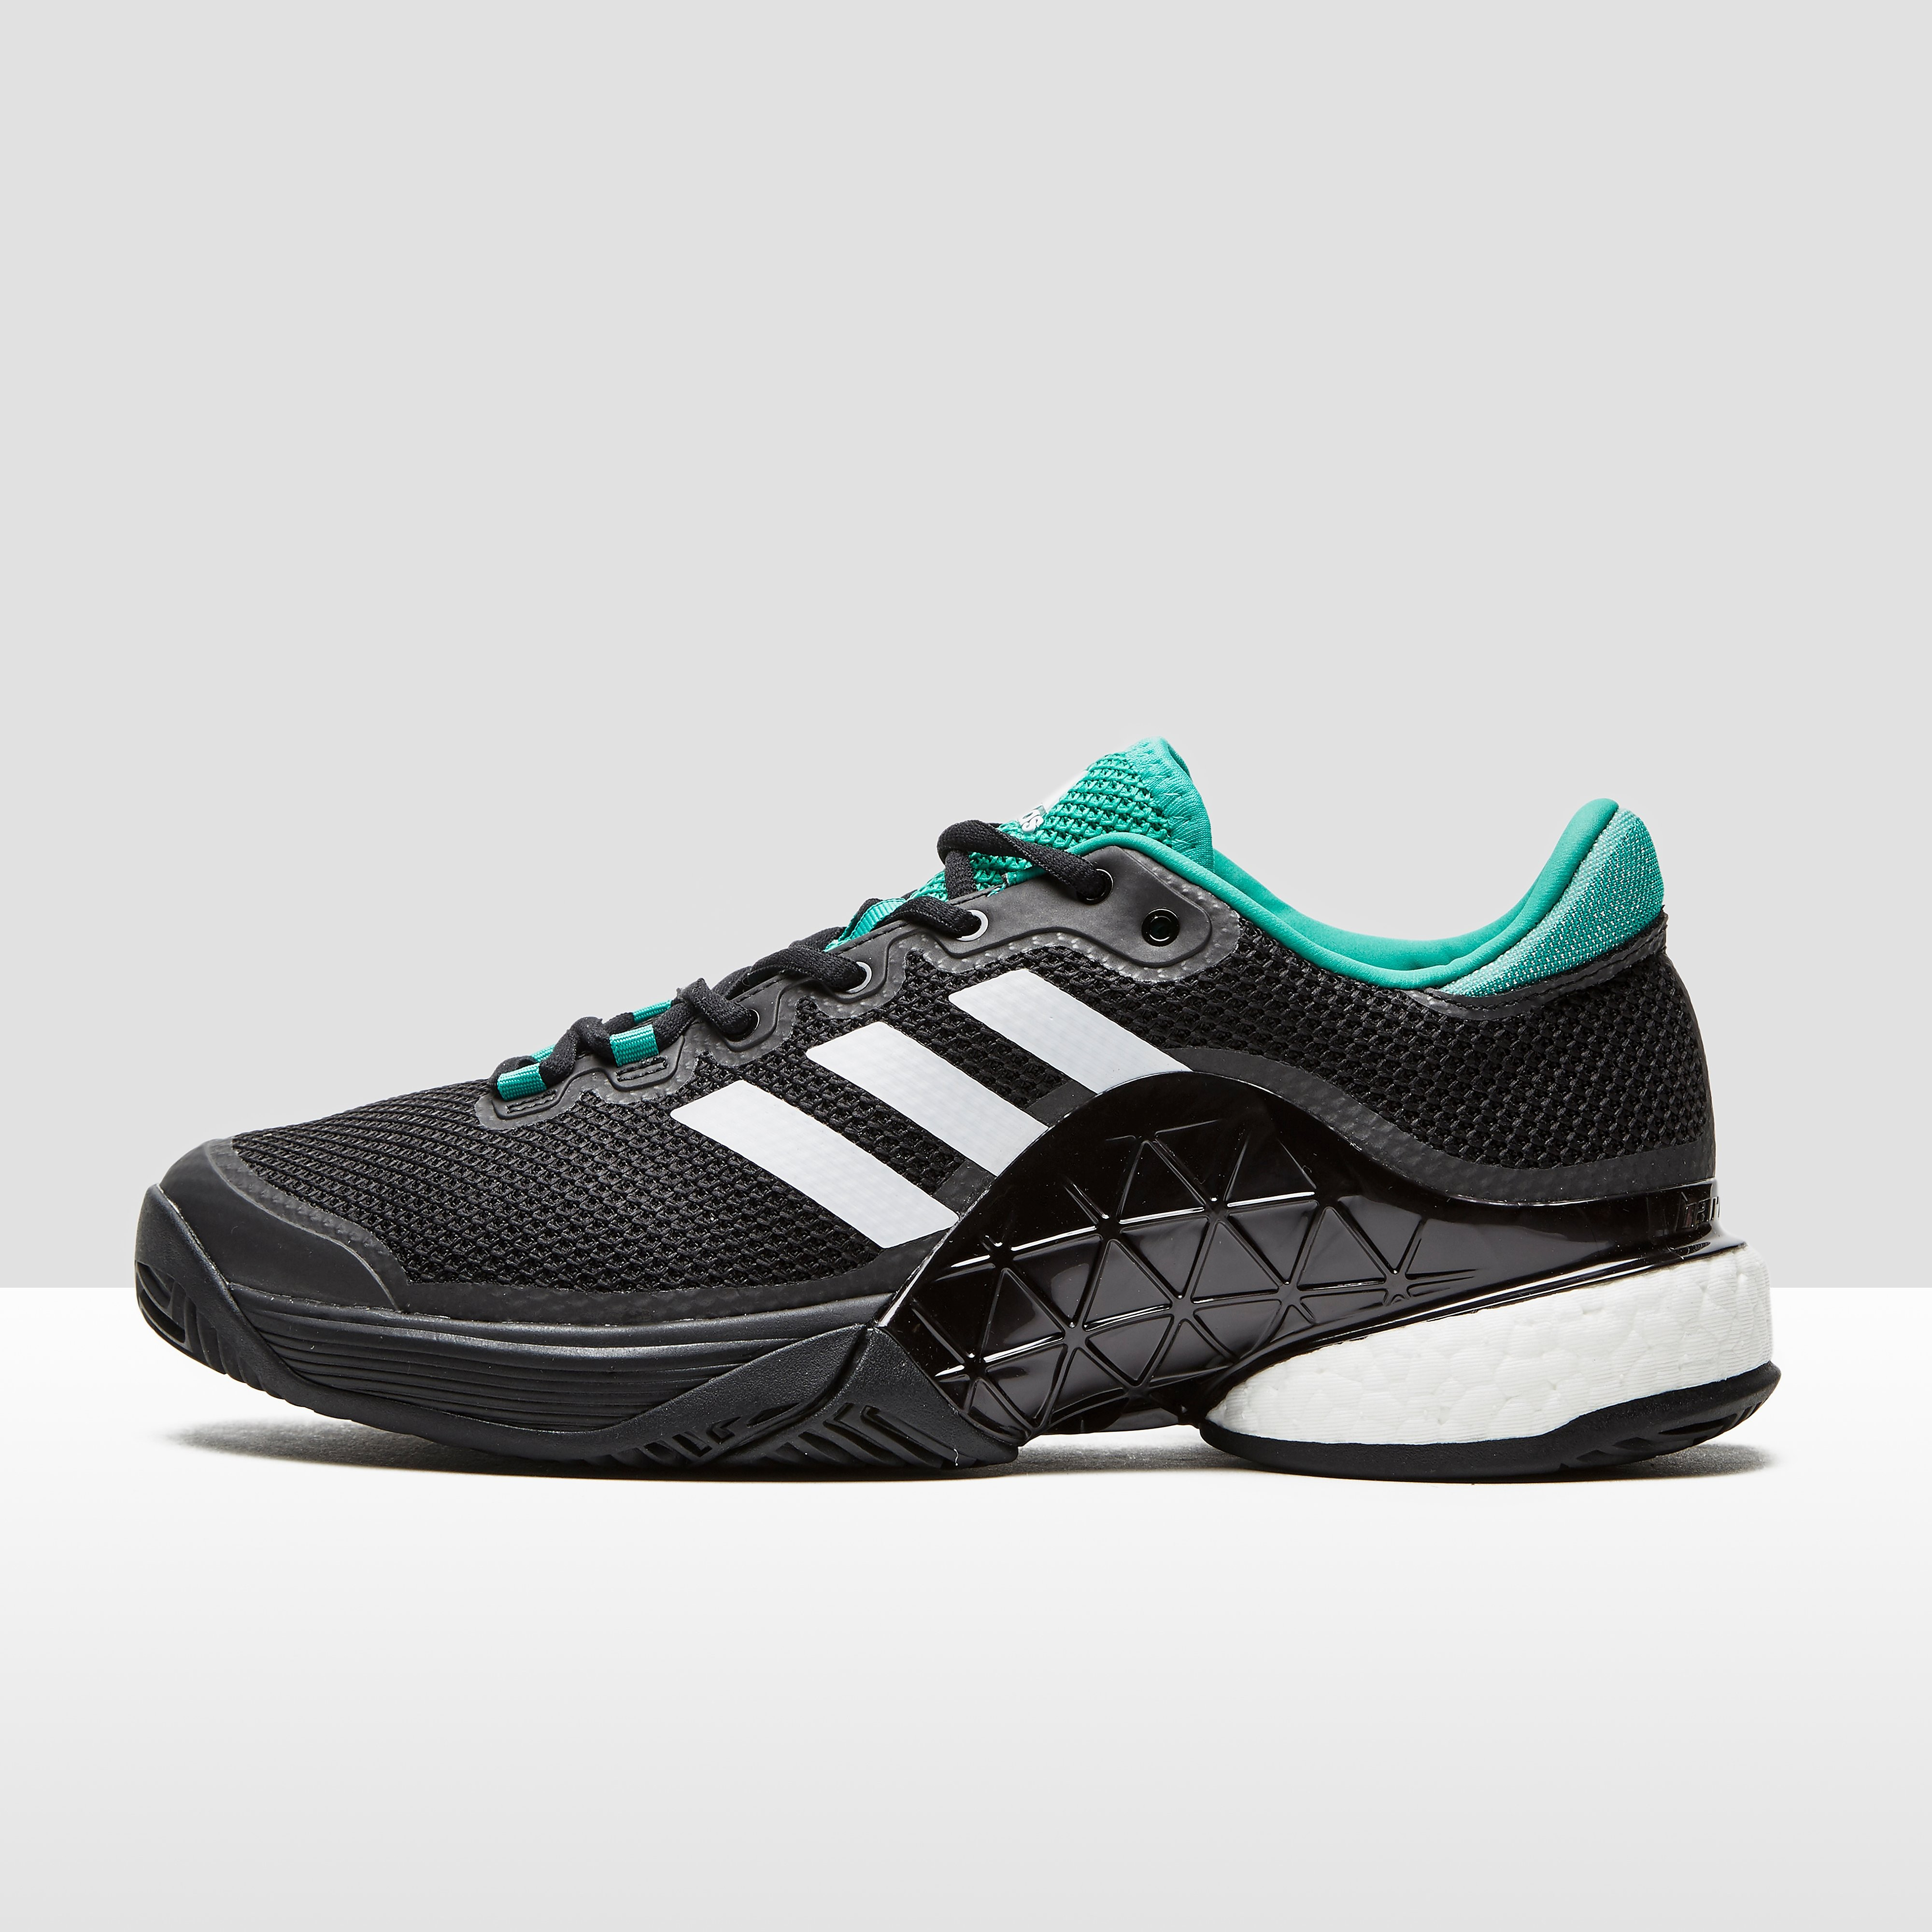 adidas Barricade Boost Men's Tennis Shoes